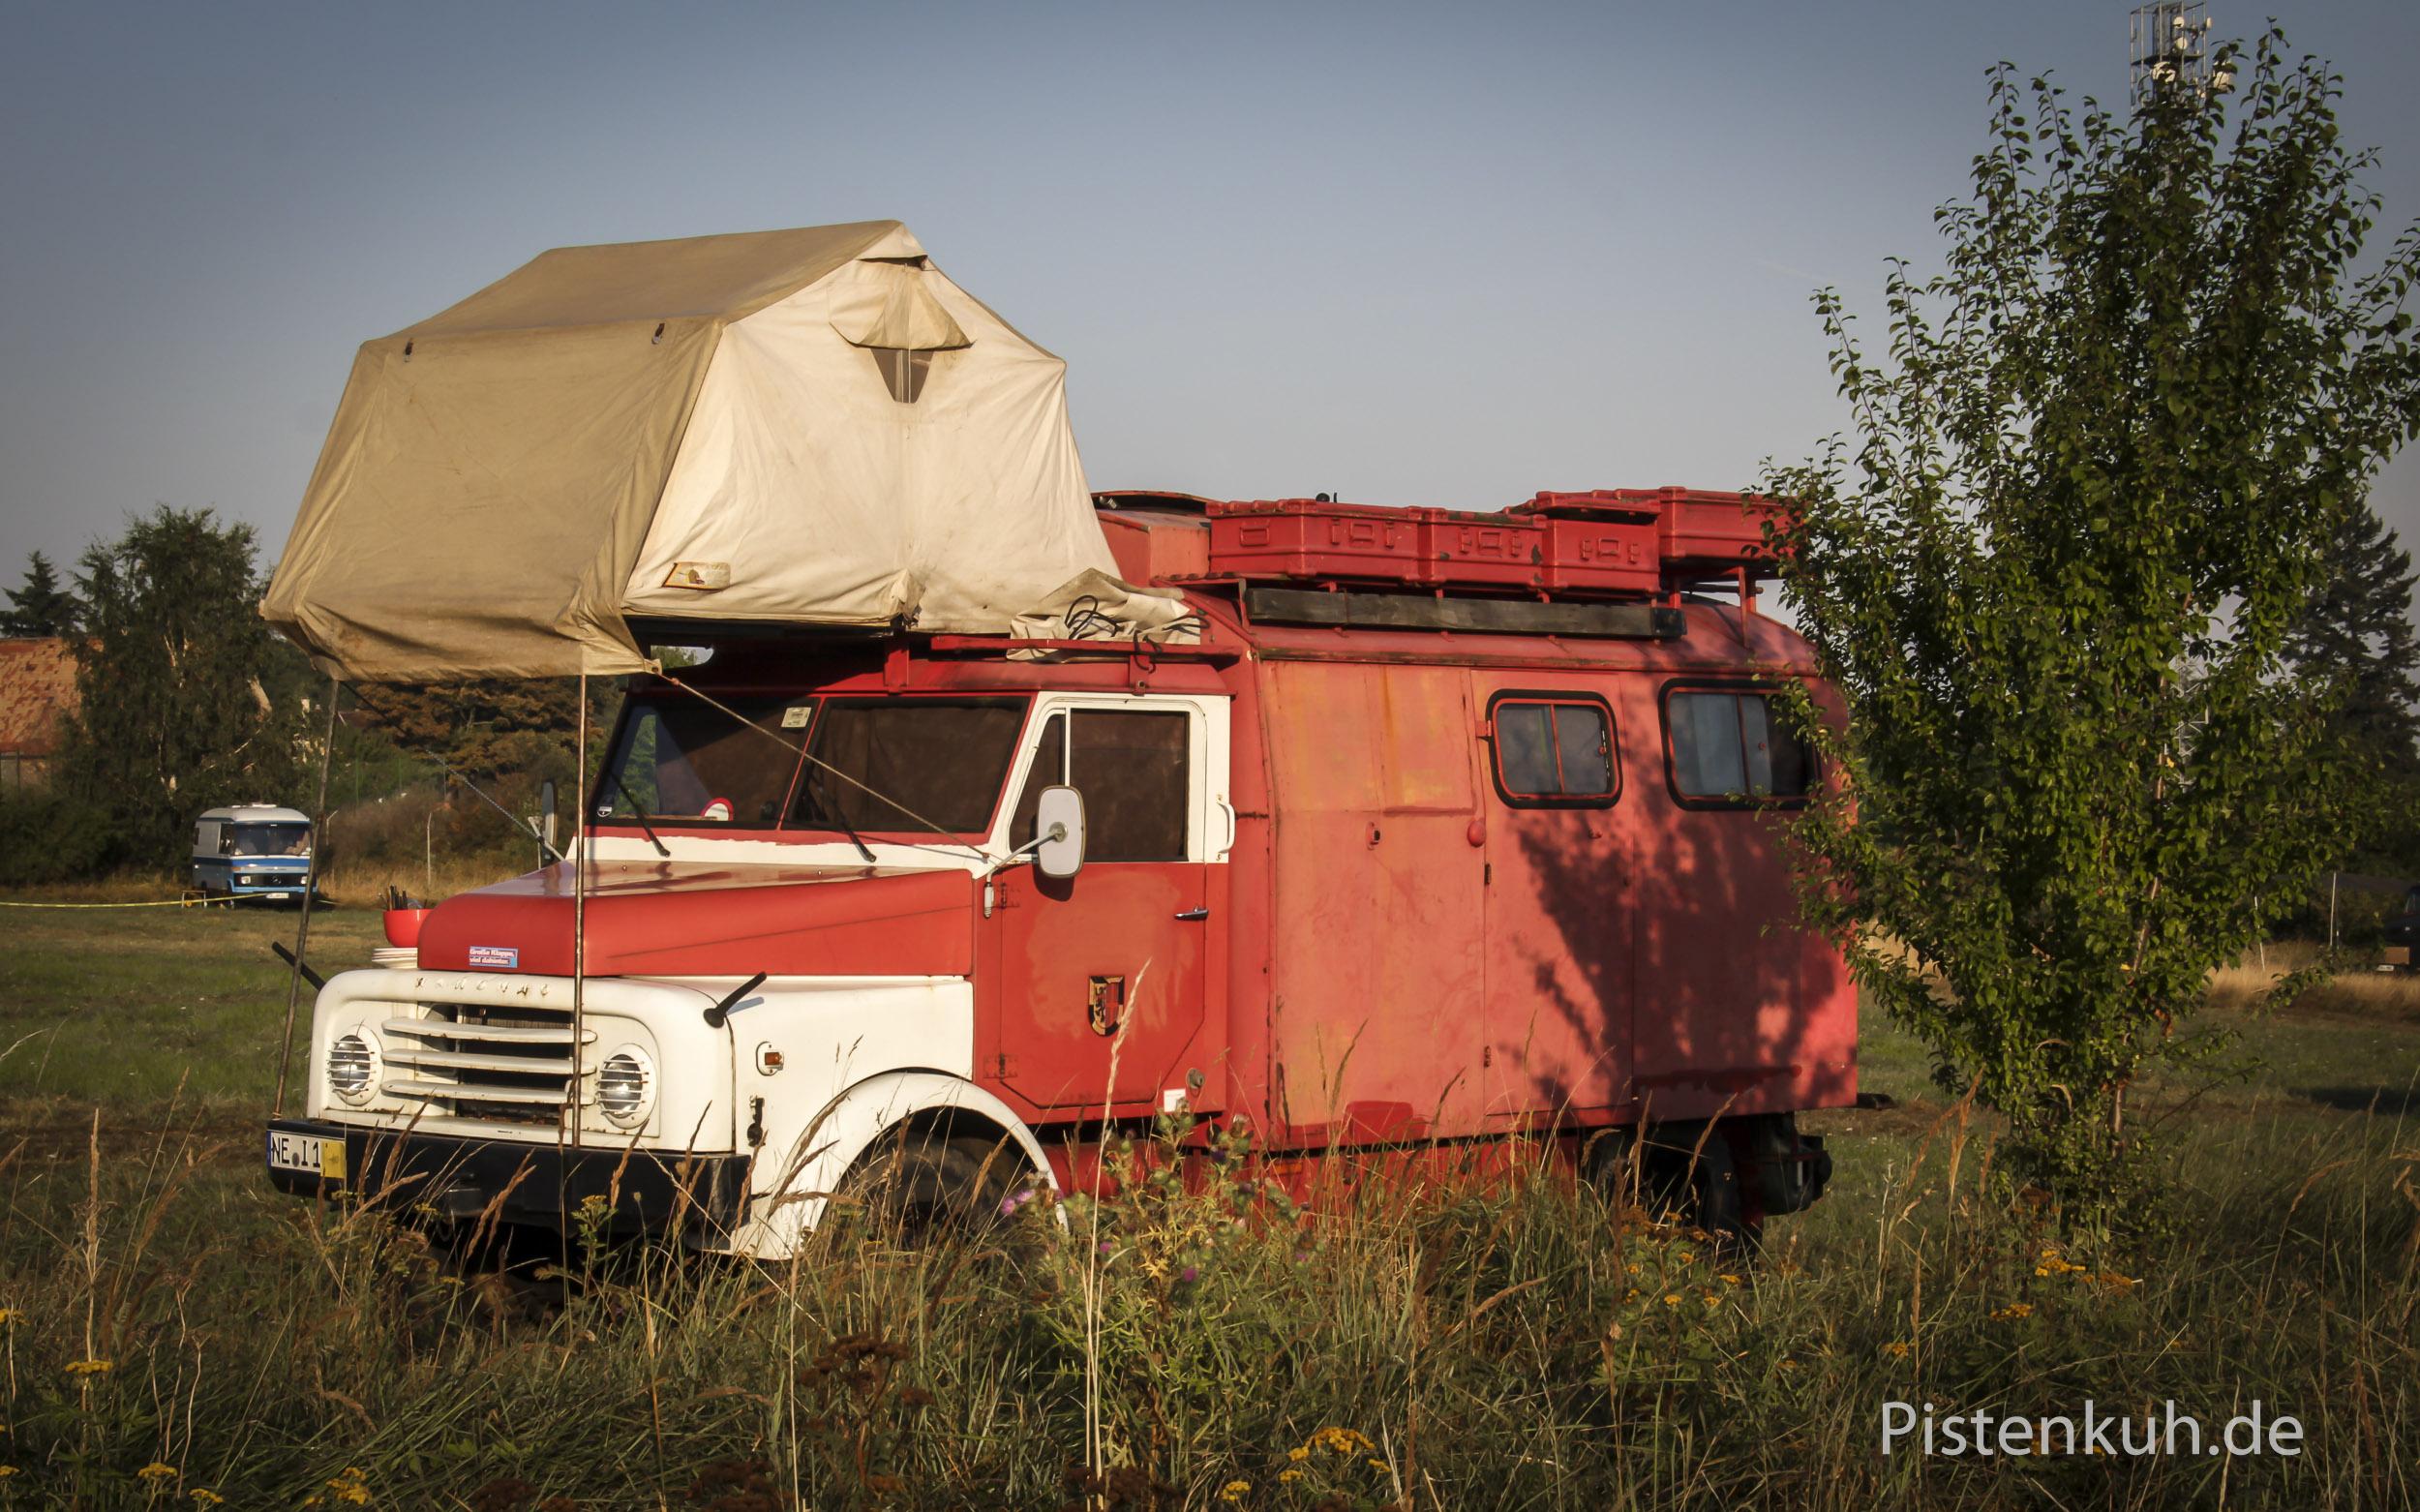 Sonstige Expeditionsmobile - Pistenkuh